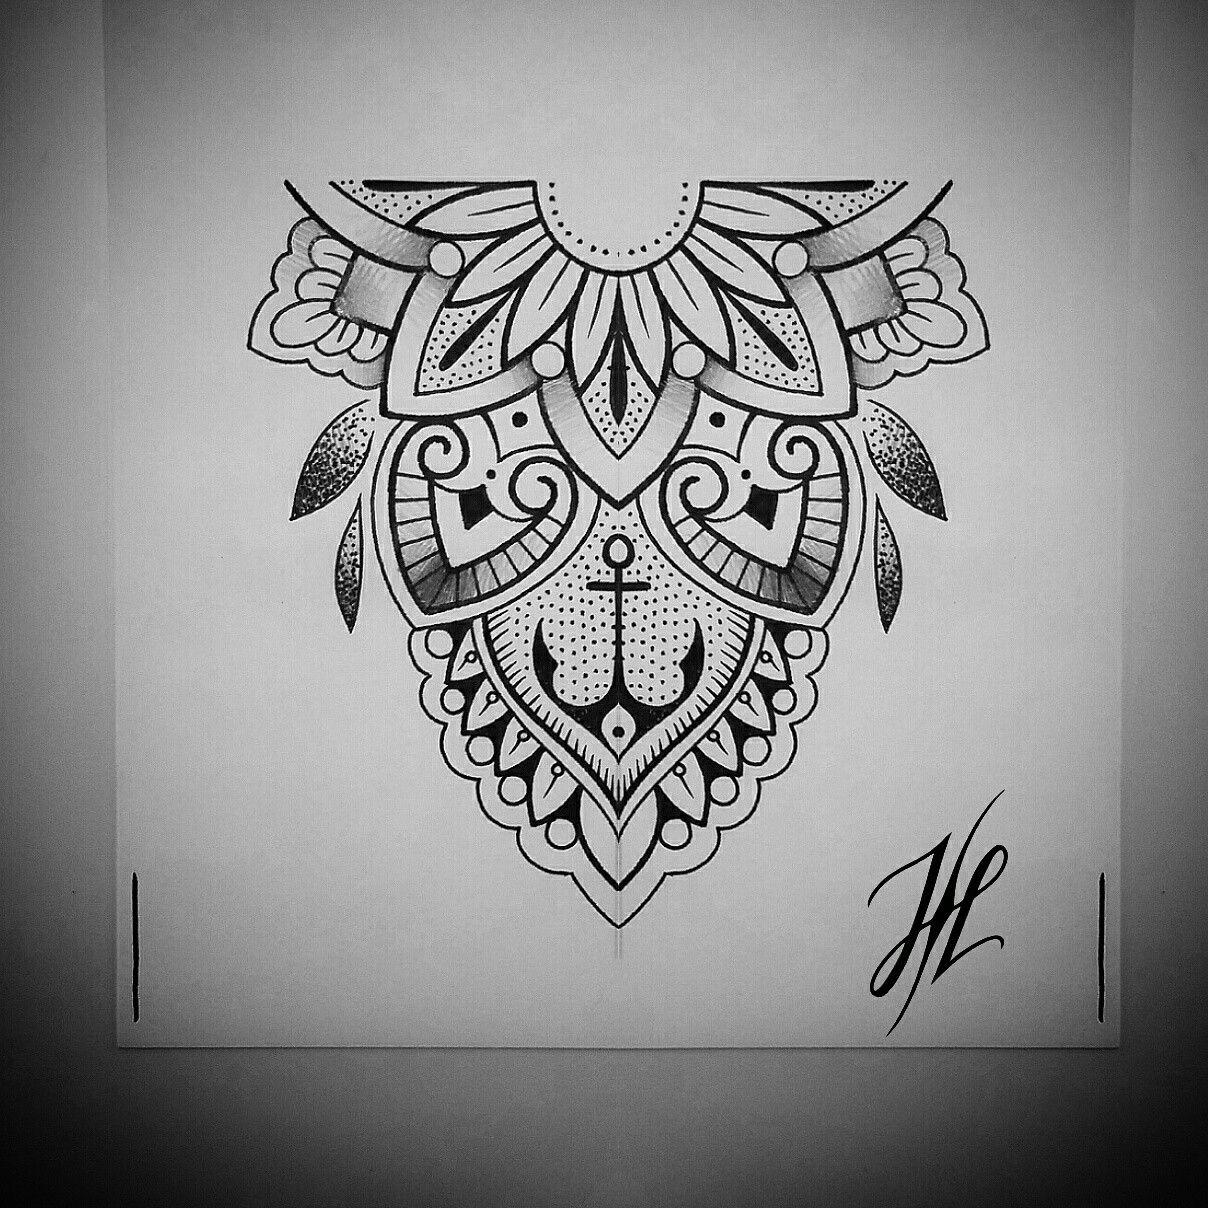 Mandala Tattoo Design On Pinterest: Ornaments Mandala Design By Marjorianne